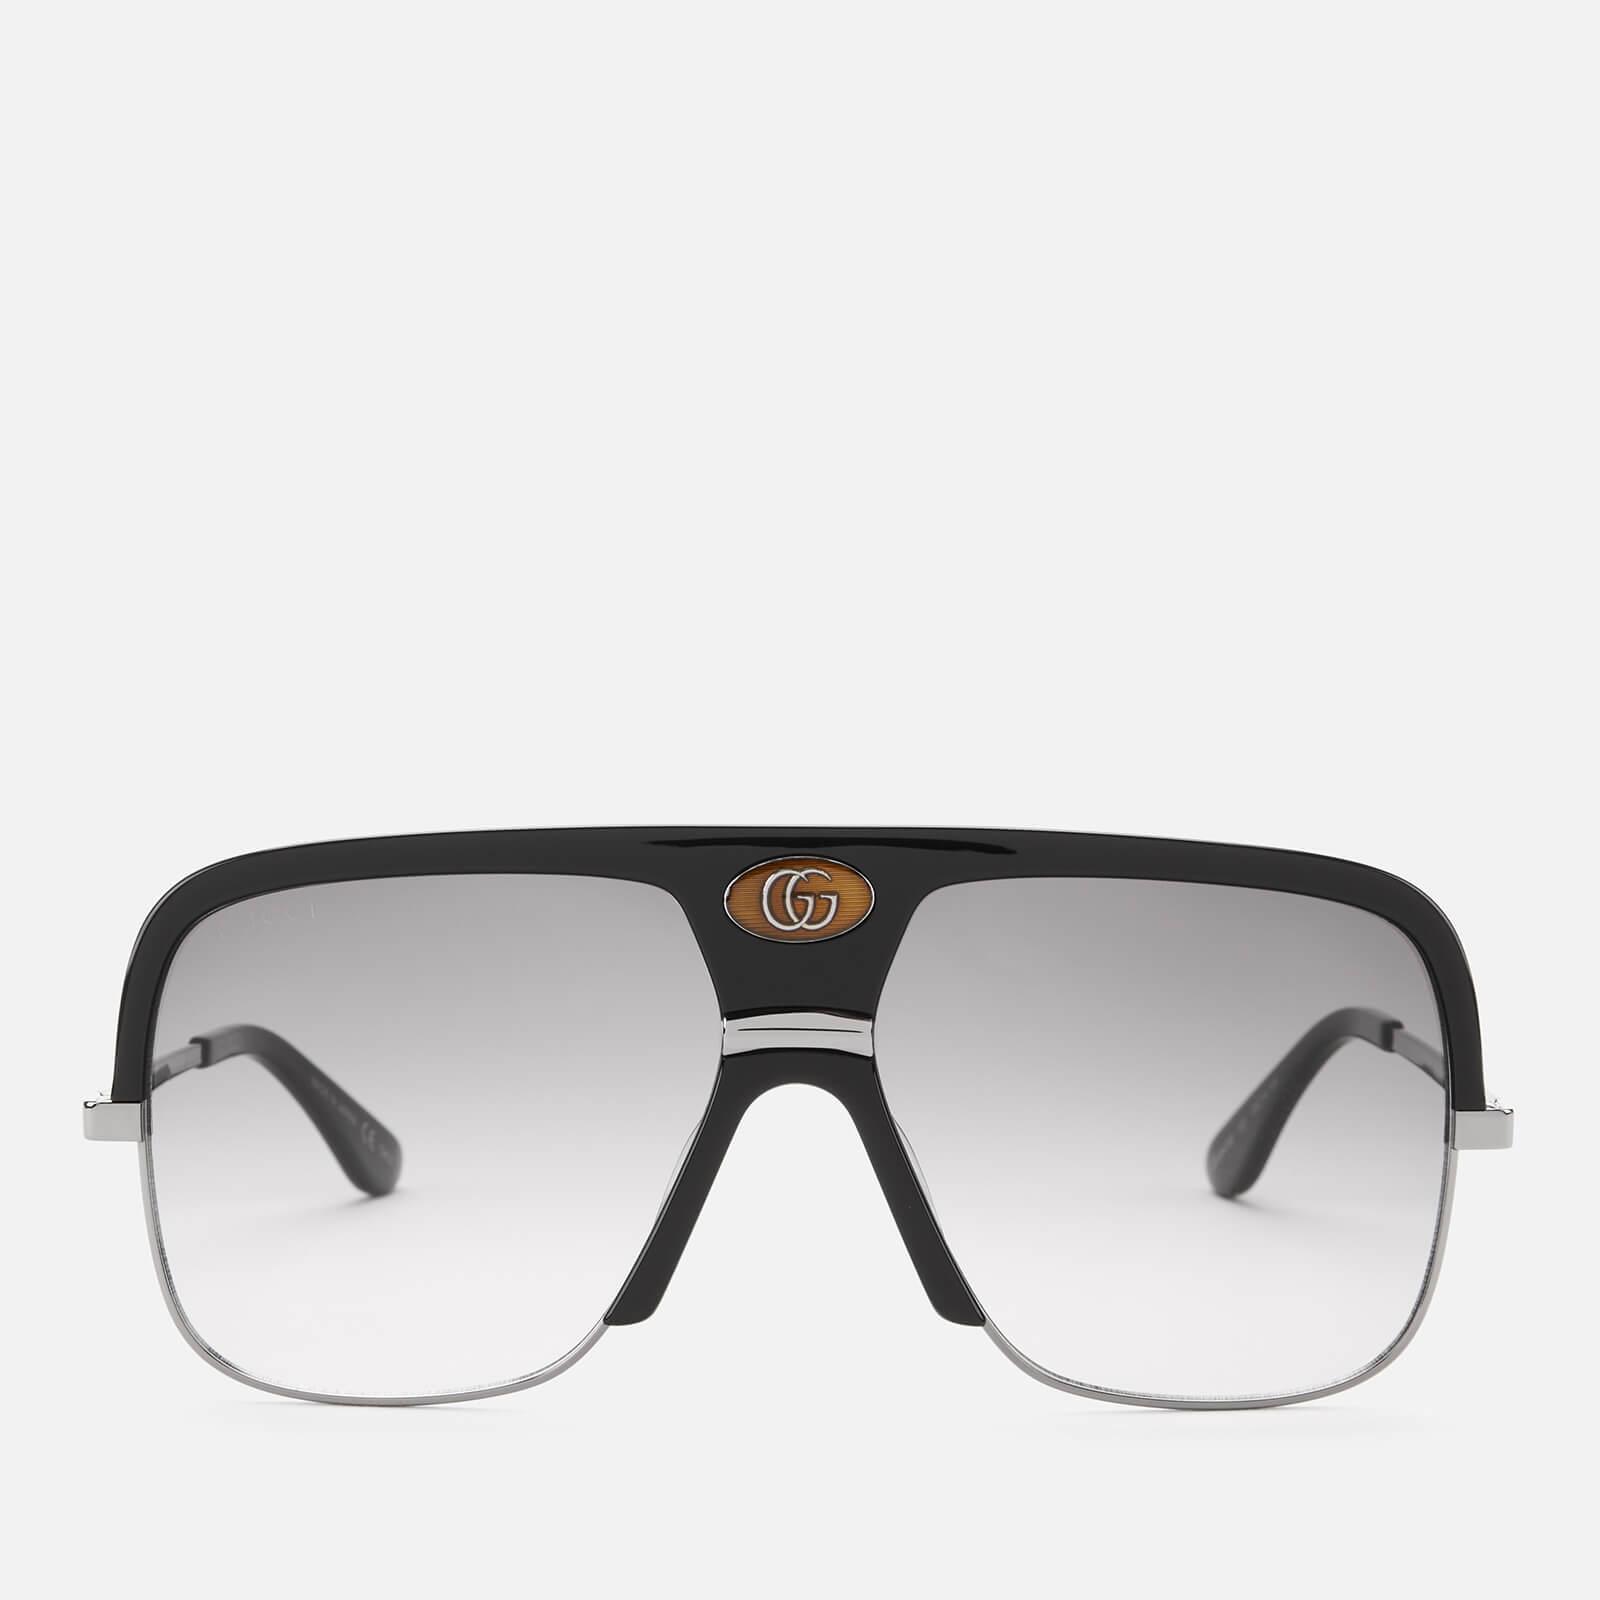 Gucci Men's Square Frame Metal/Acetate Sunglasses - Black/Grey